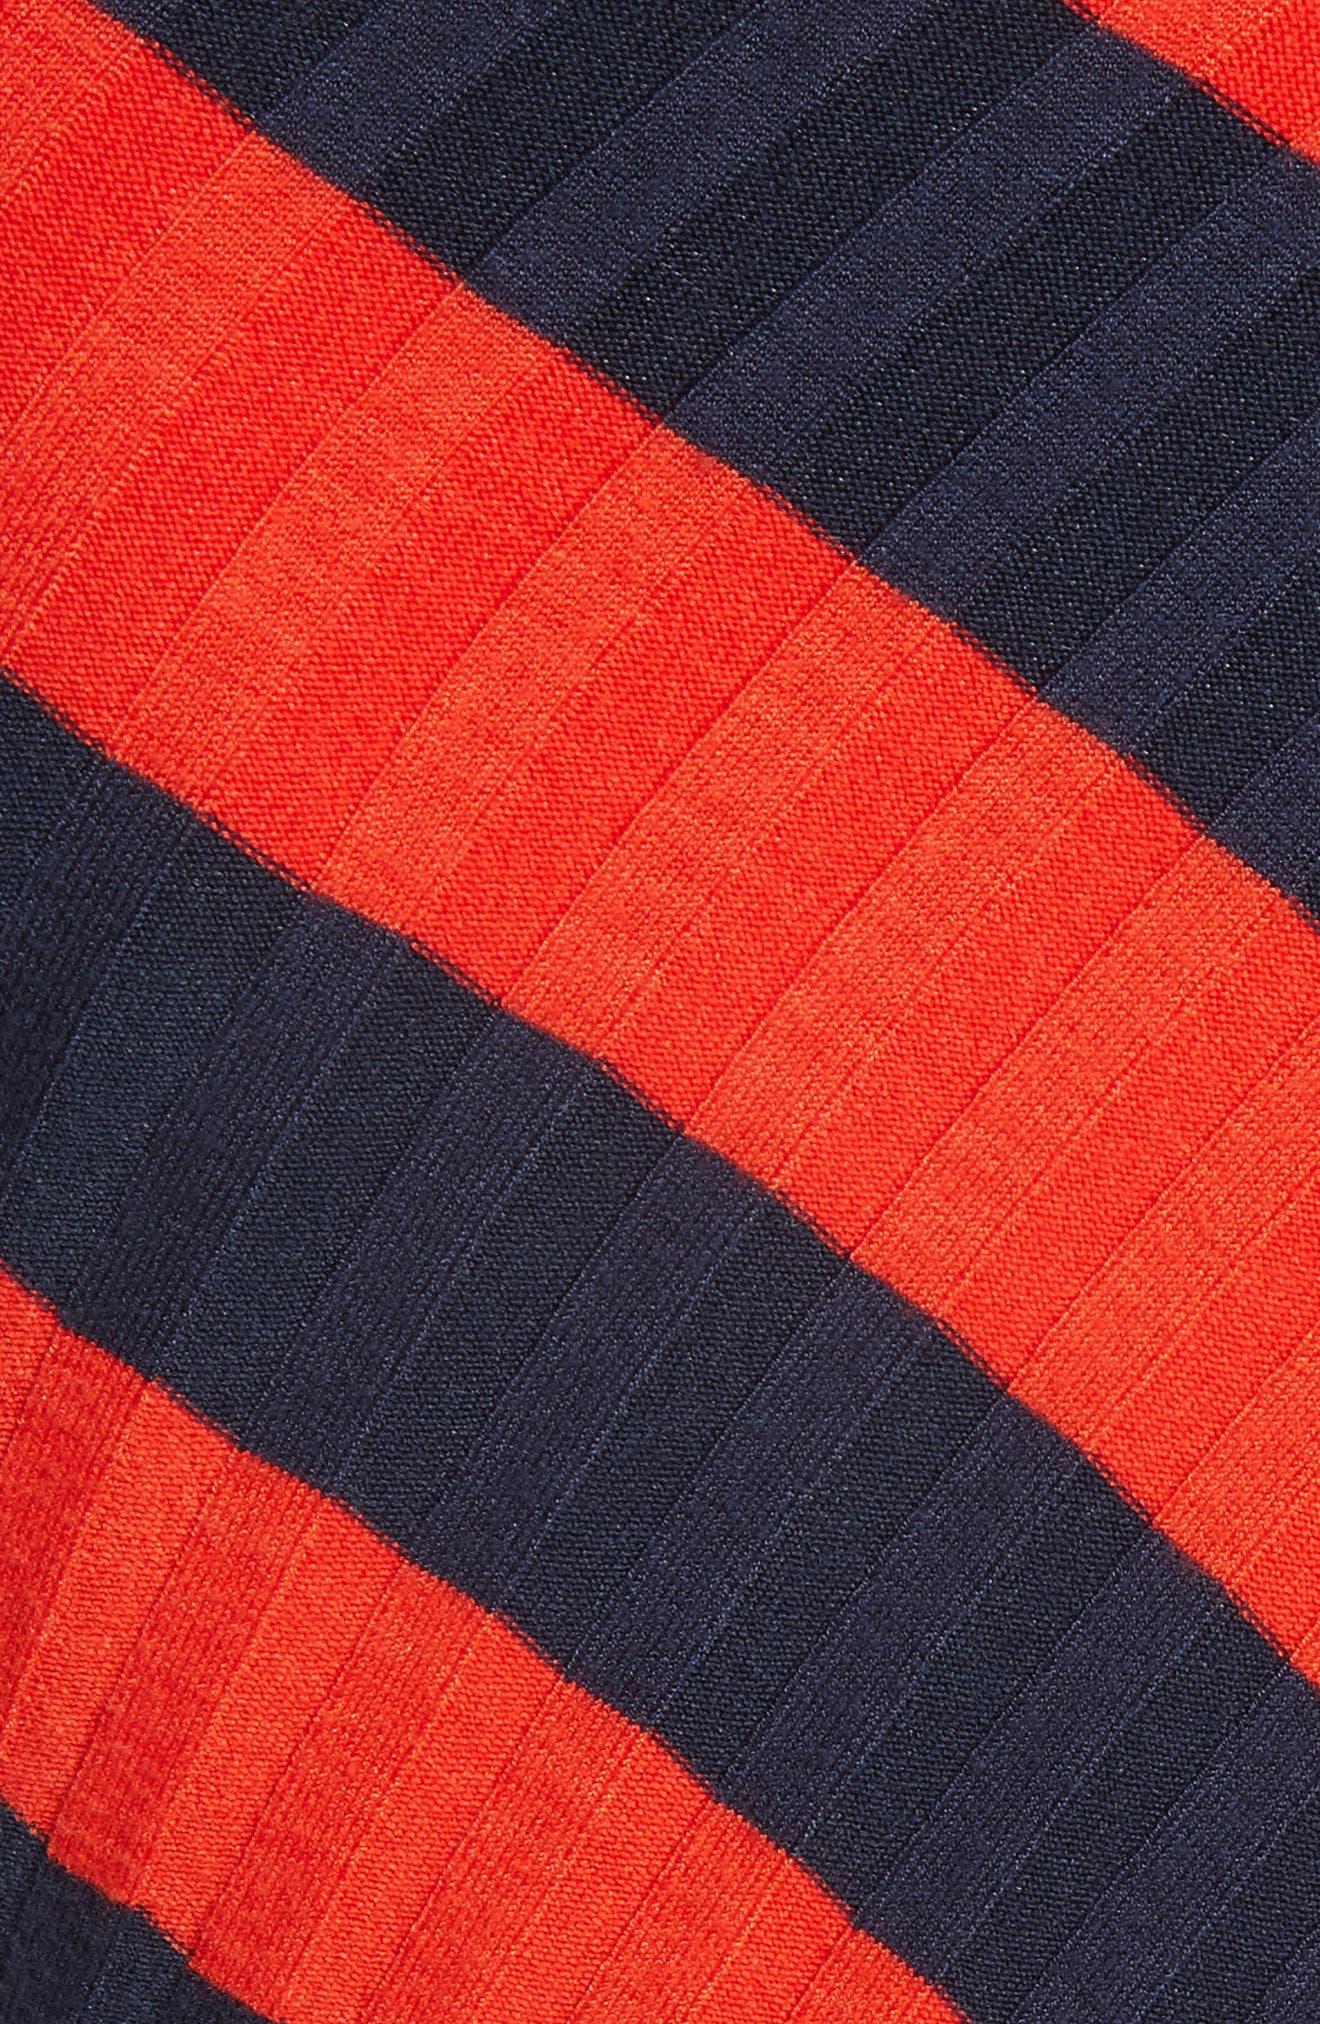 Asymmetrical Stripe Sweater,                             Alternate thumbnail 6, color,                             Persimmon